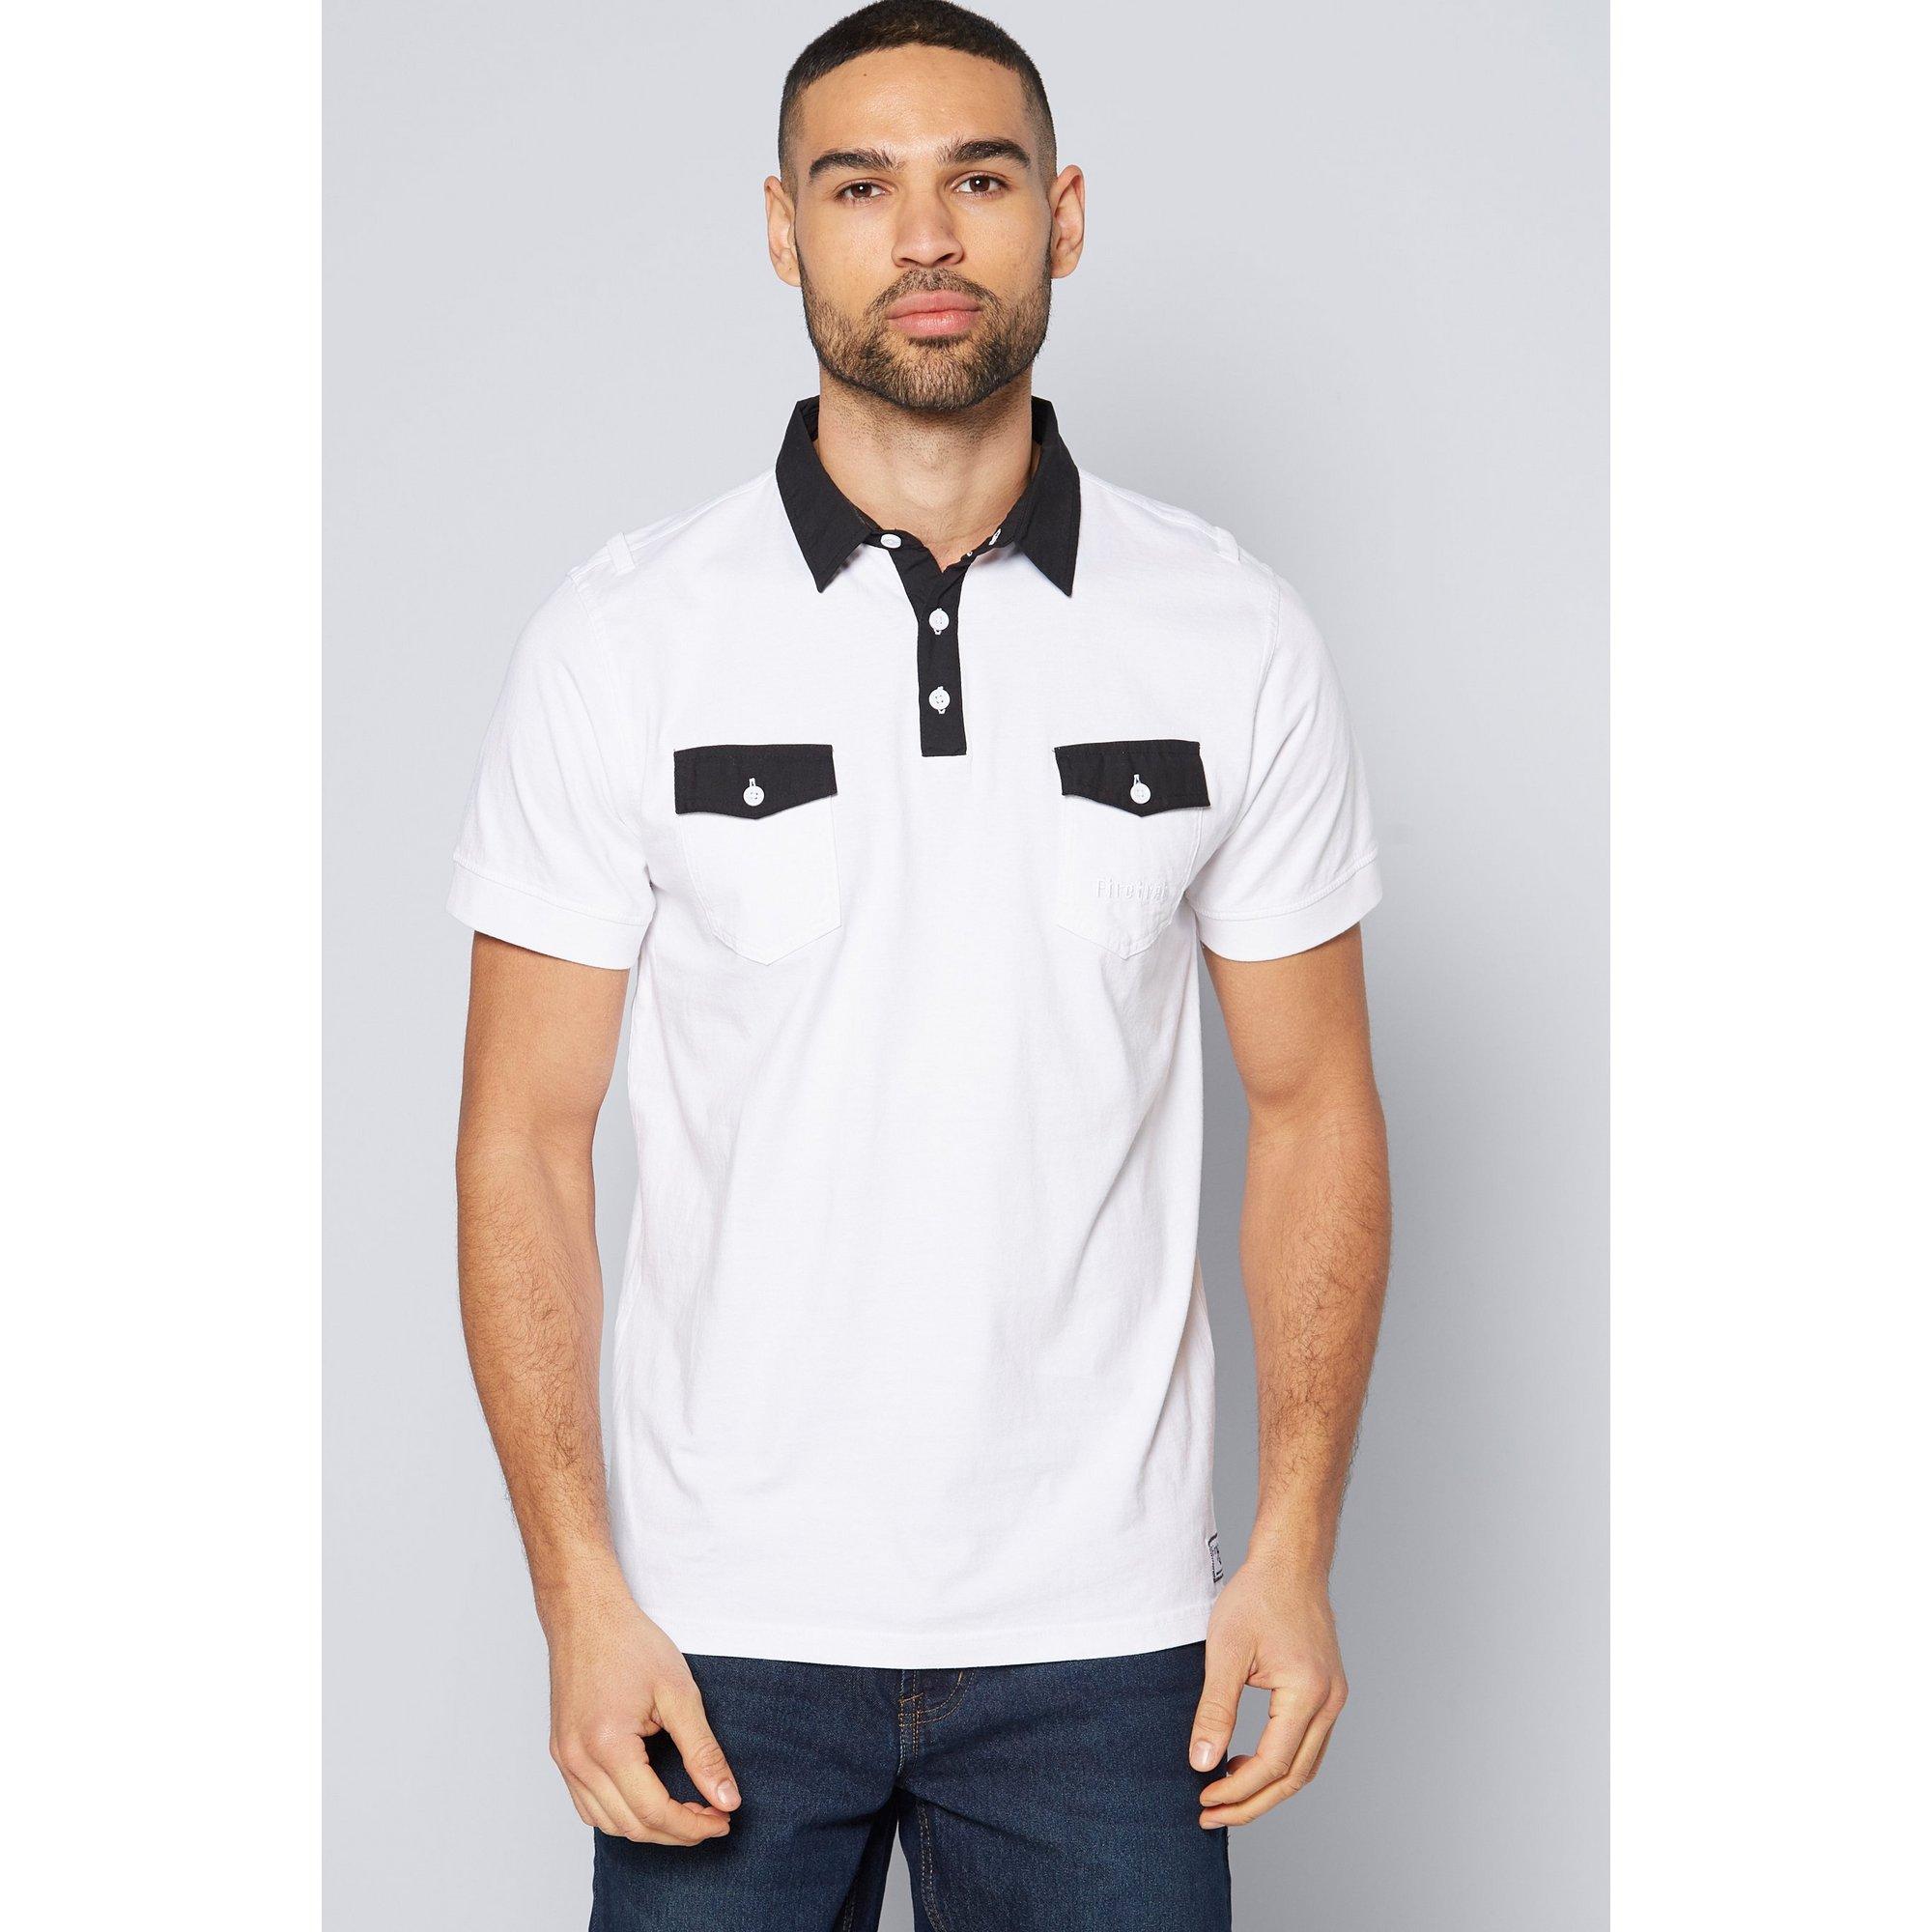 Image of Firetrap Pocket Polo Shirt